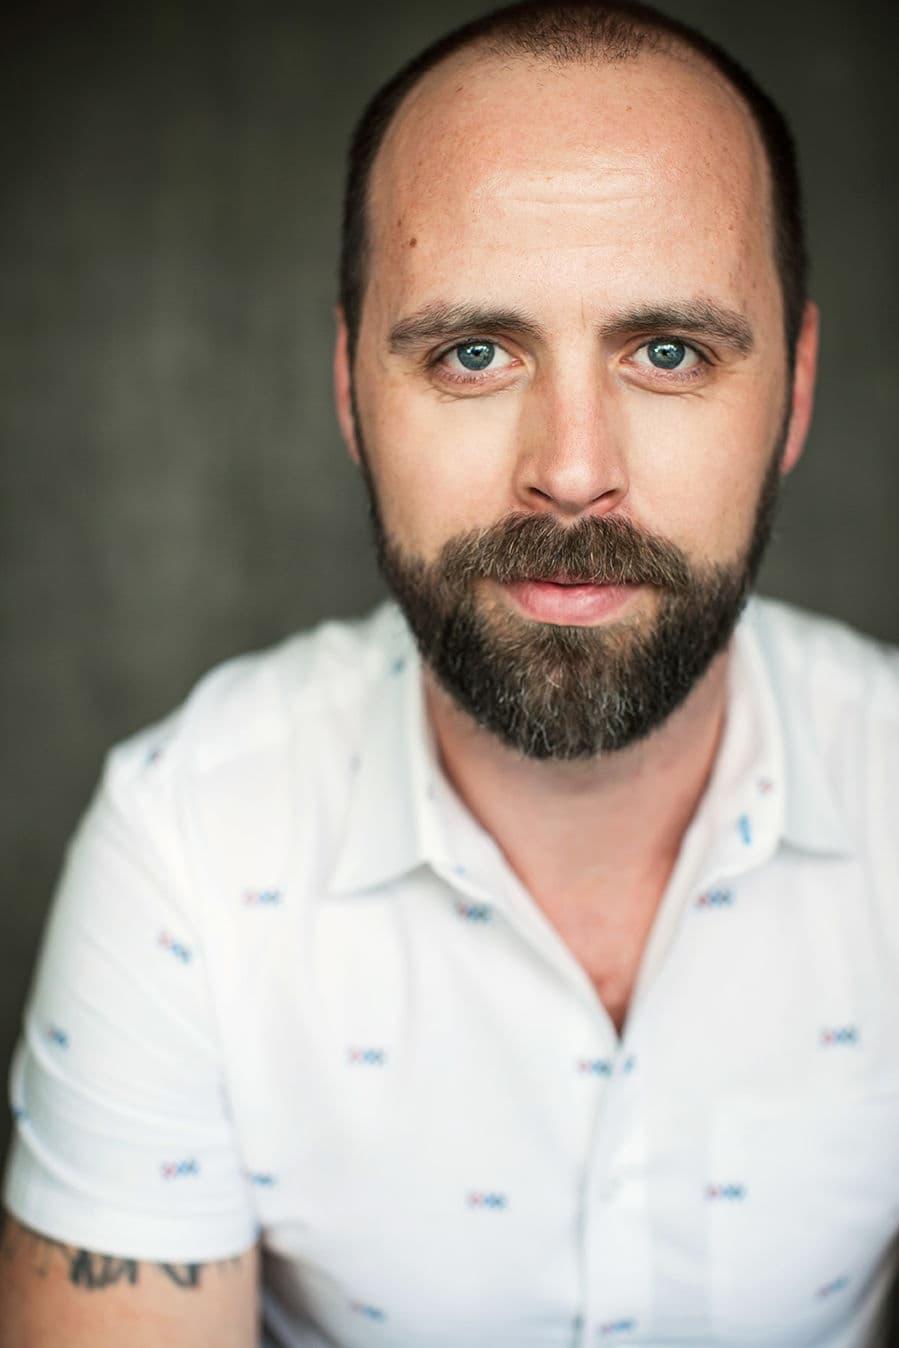 Joshua Hinkson